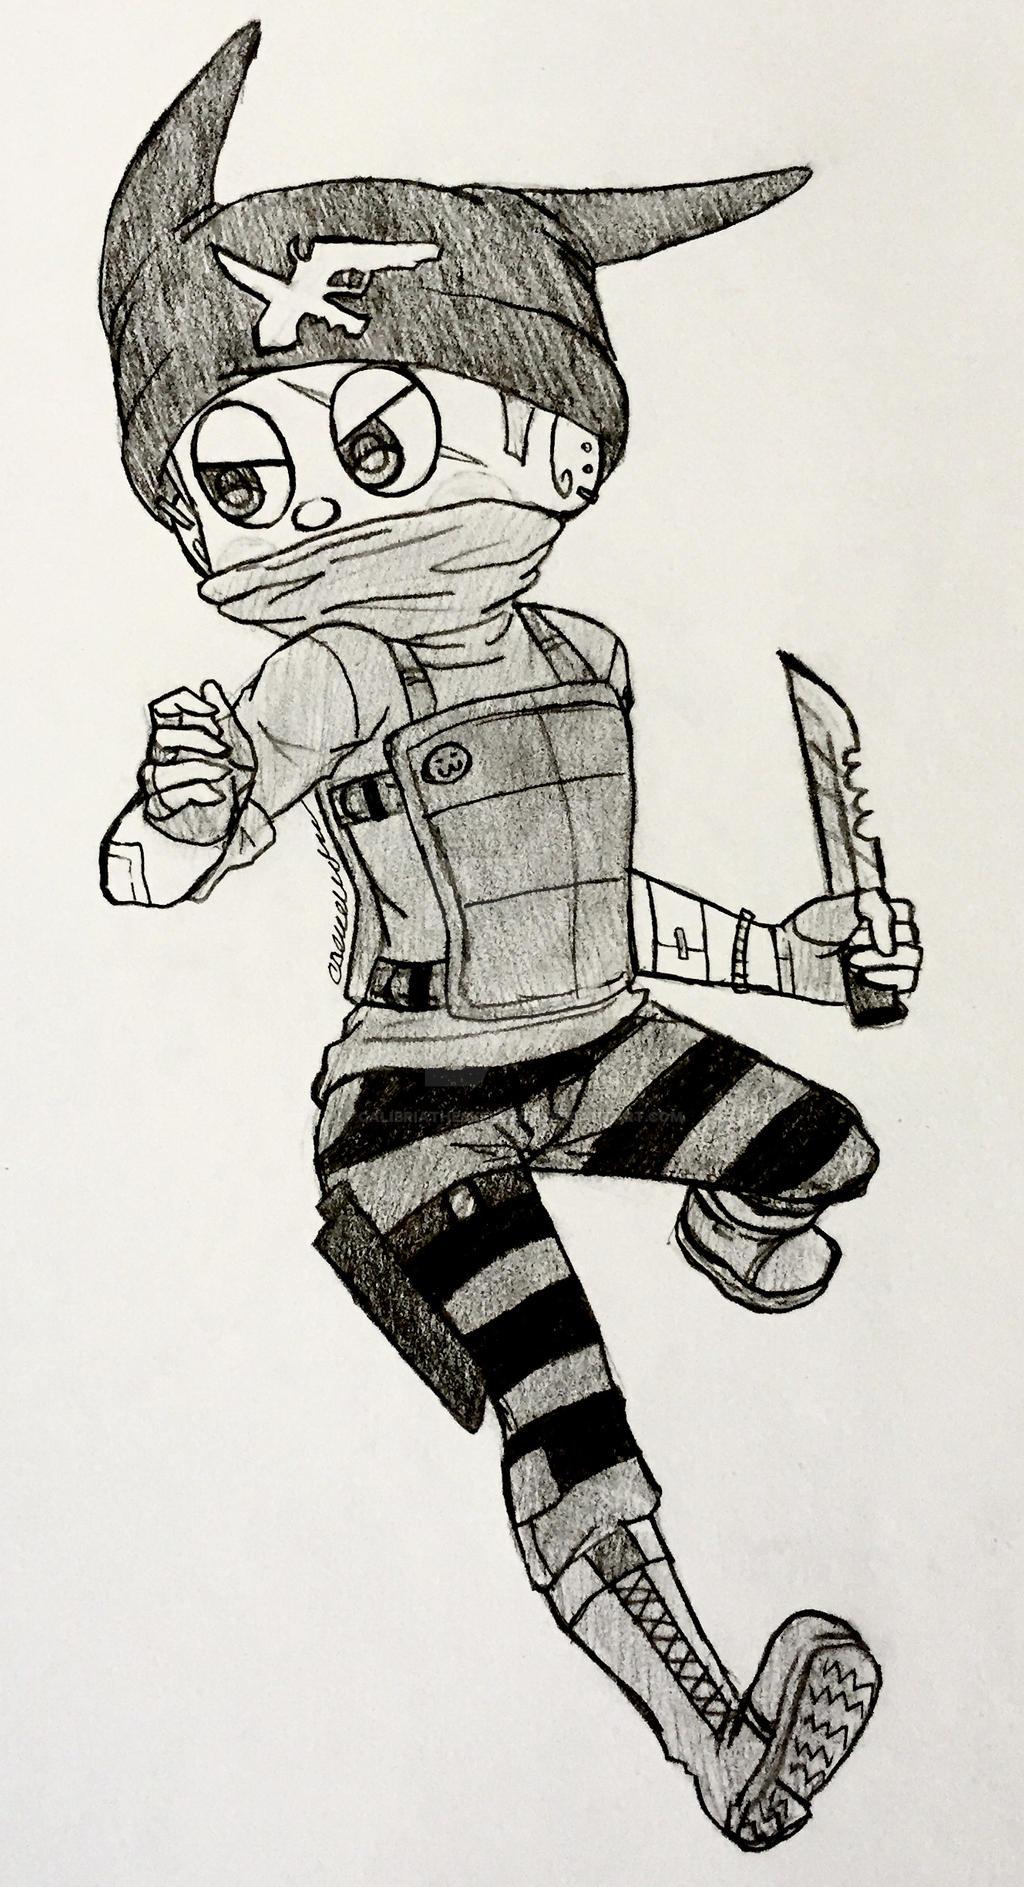 Ryoma Hoshi Shsl Assassin By Calibriatheskeleton On Deviantart Read i'll prove it to you. ryoma hoshi shsl assassin by